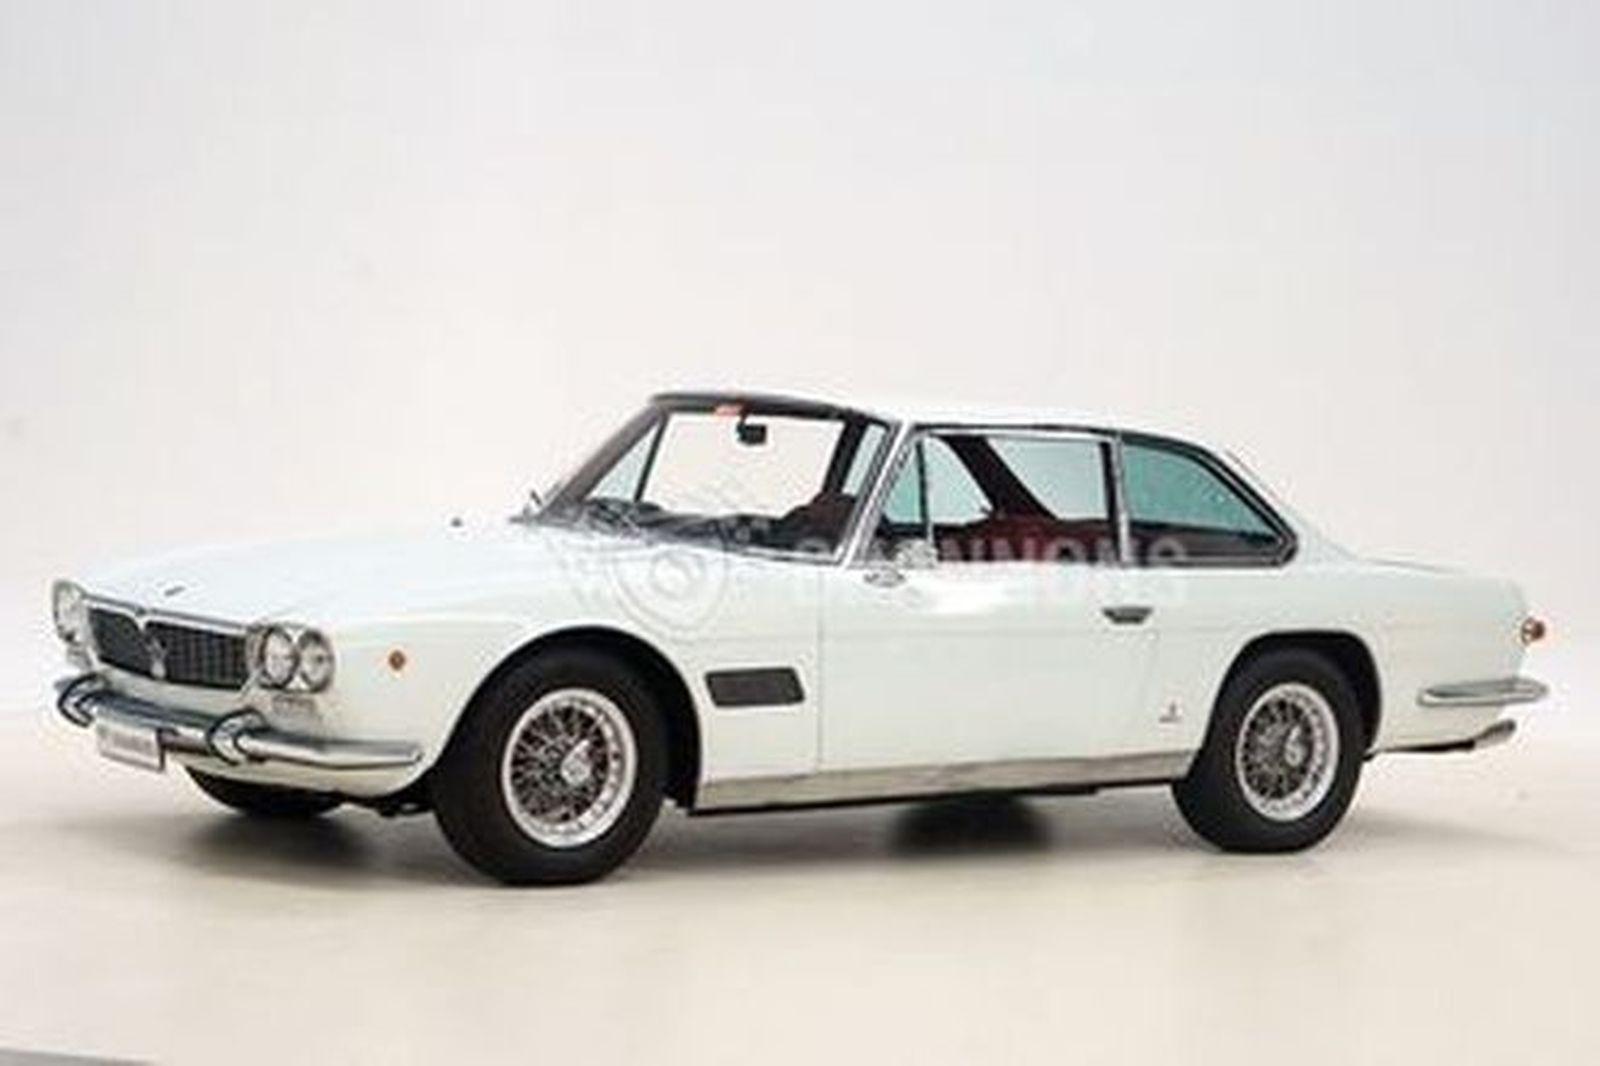 Maserati Mexico 4.2 Coupe (LHD)